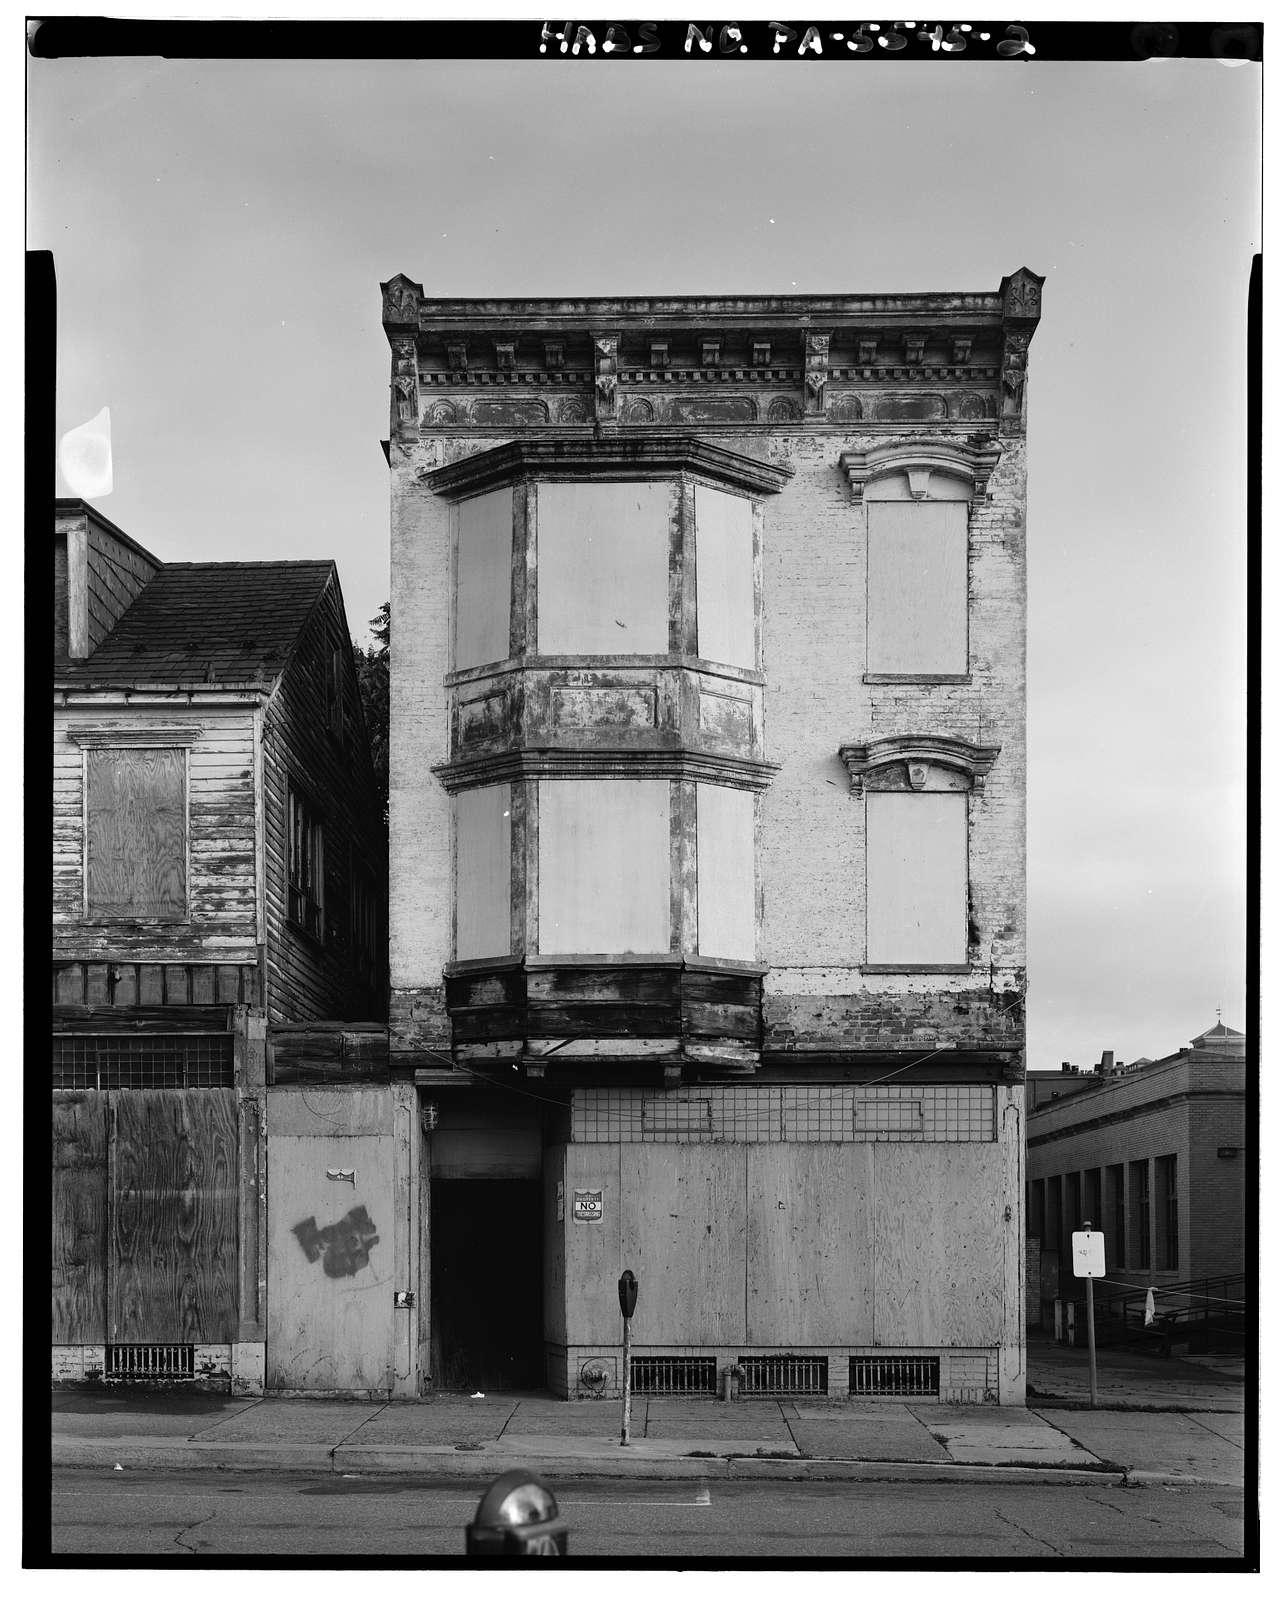 George Hellick Coffee Company, 215 Ferry Street, Easton, Northampton County, PA